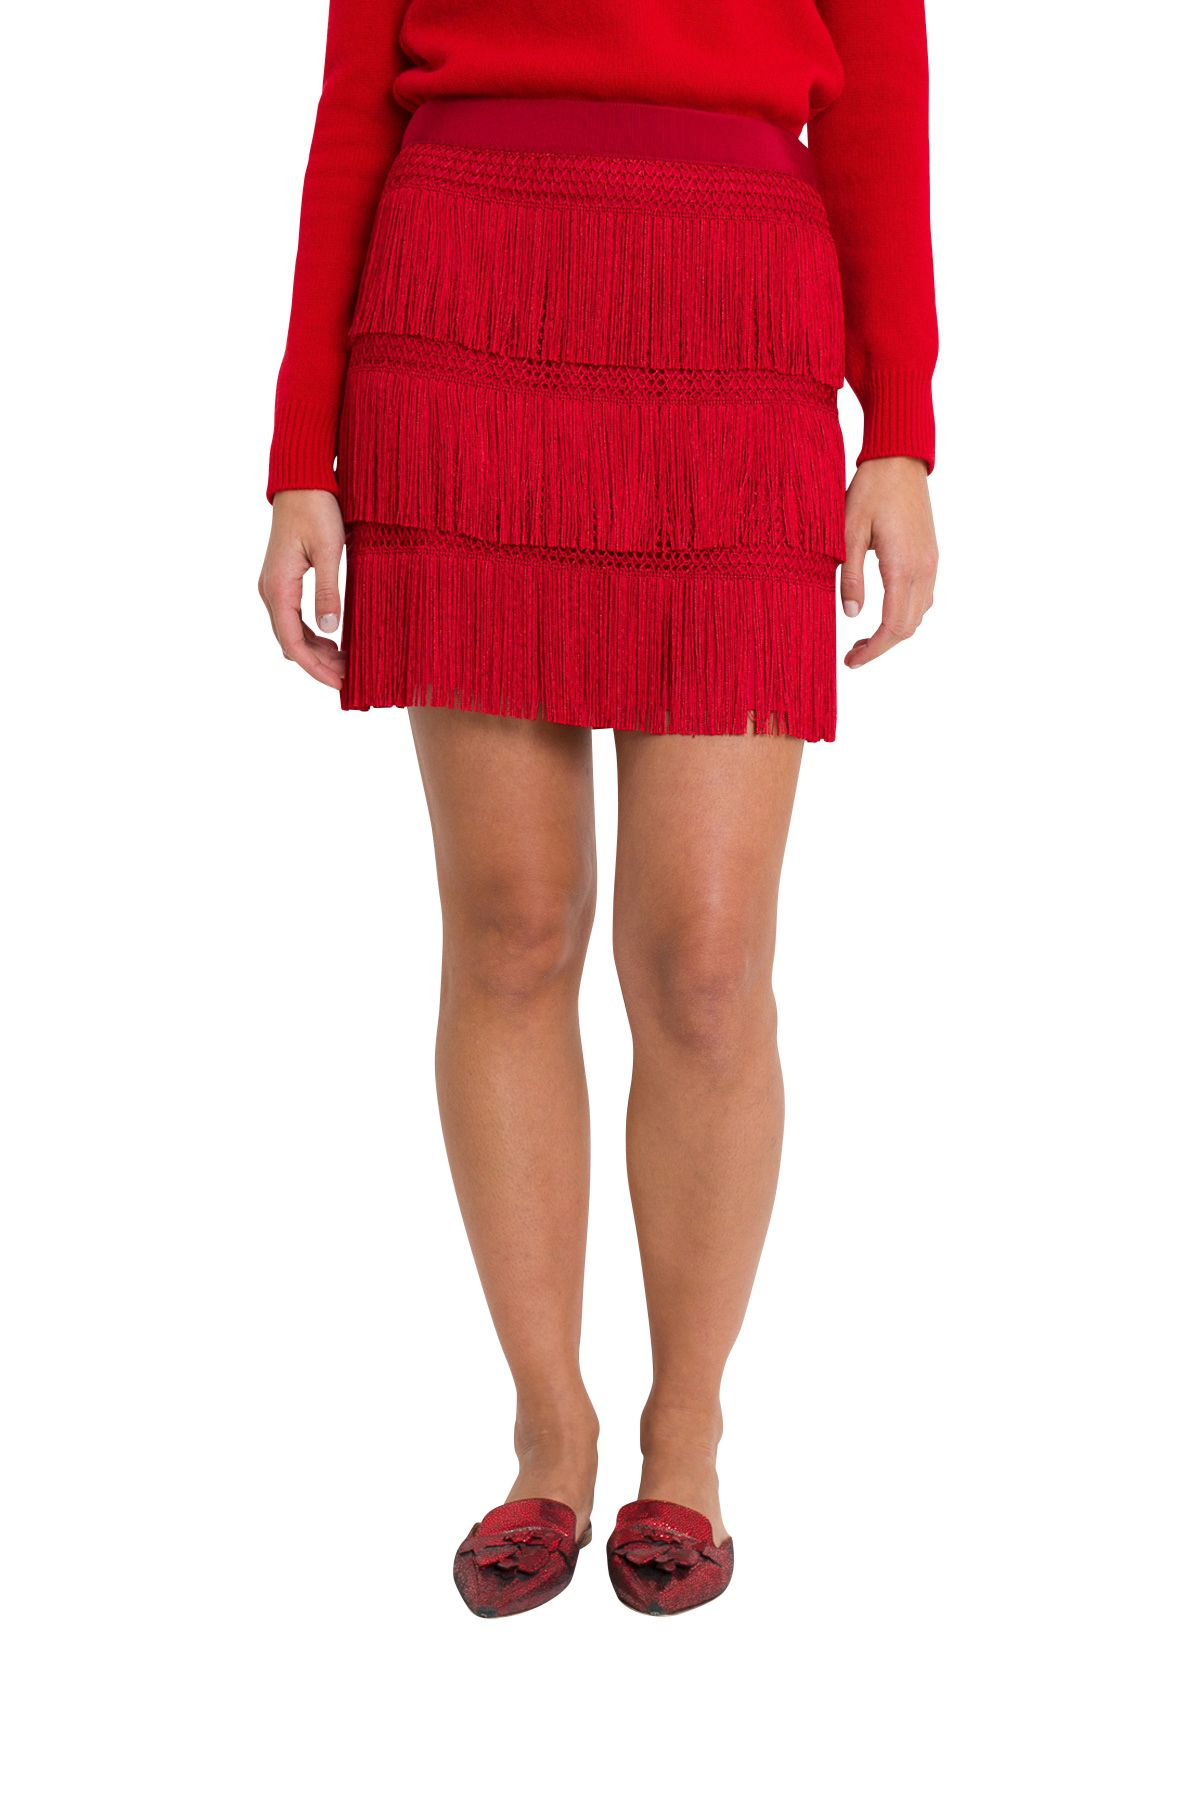 Alberta Ferretti Fringe Miniskirt